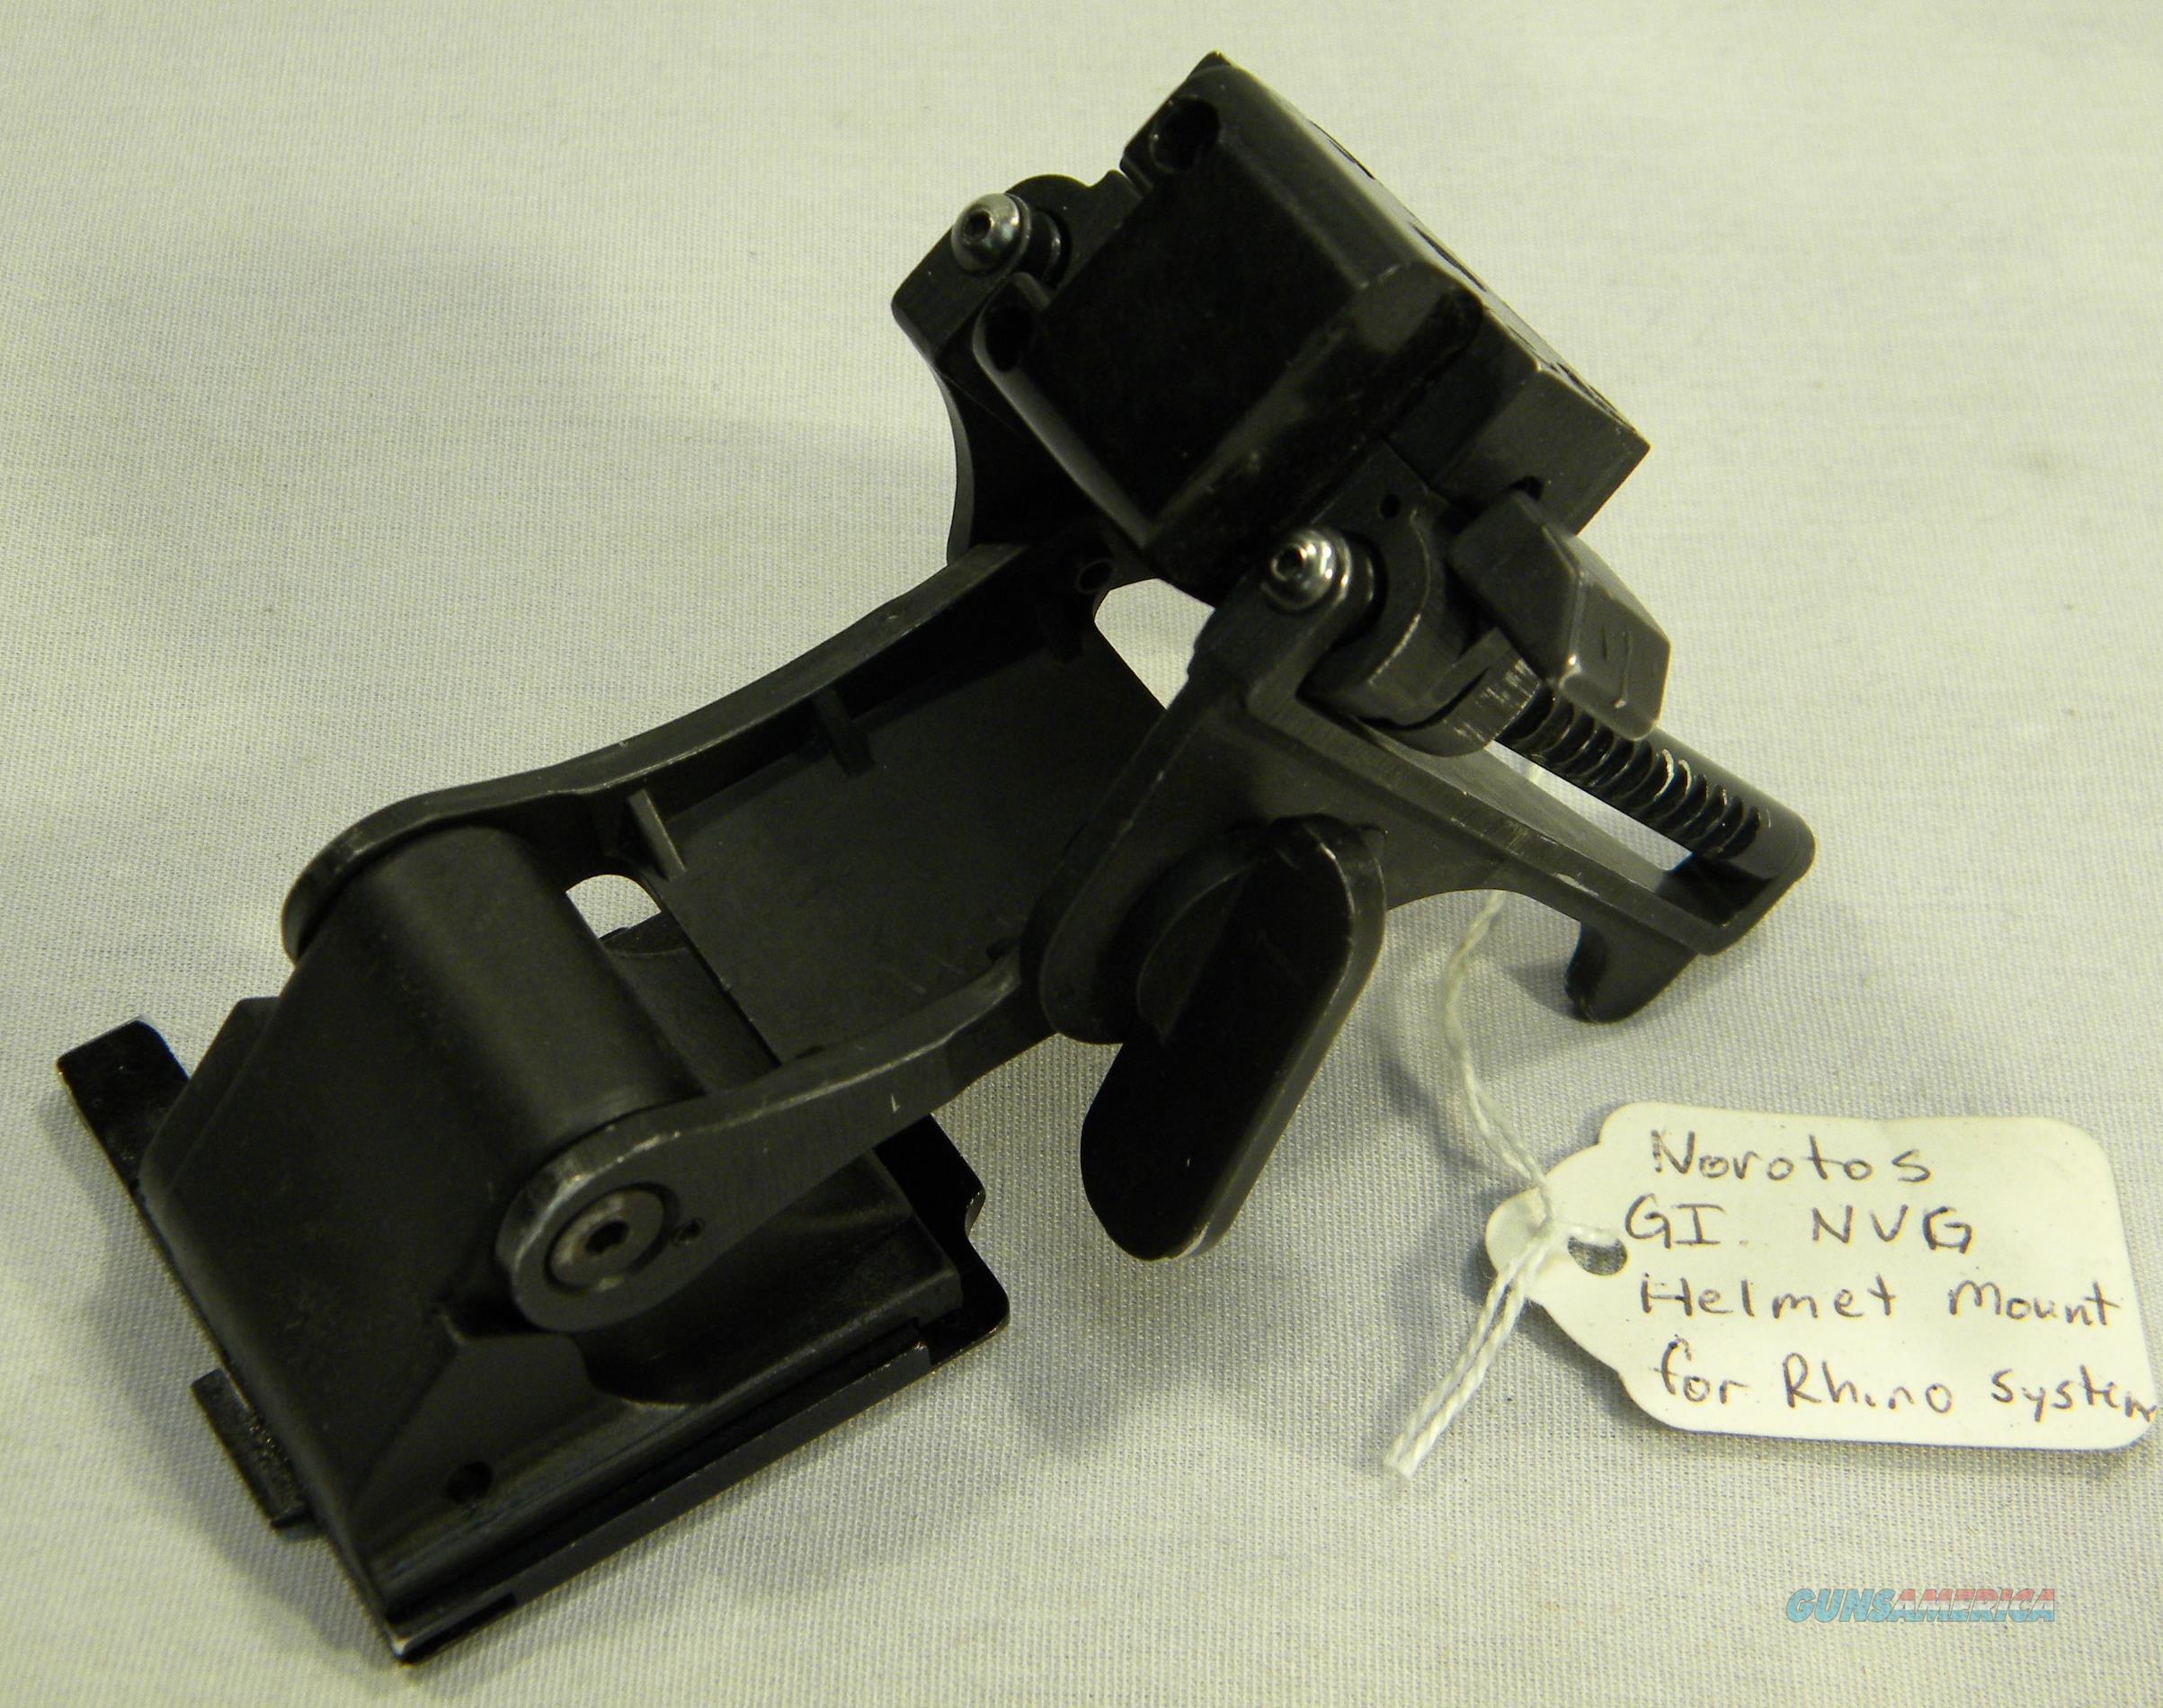 Norotos Helmet Mount For Rhino System  Non-Guns > Night Vision